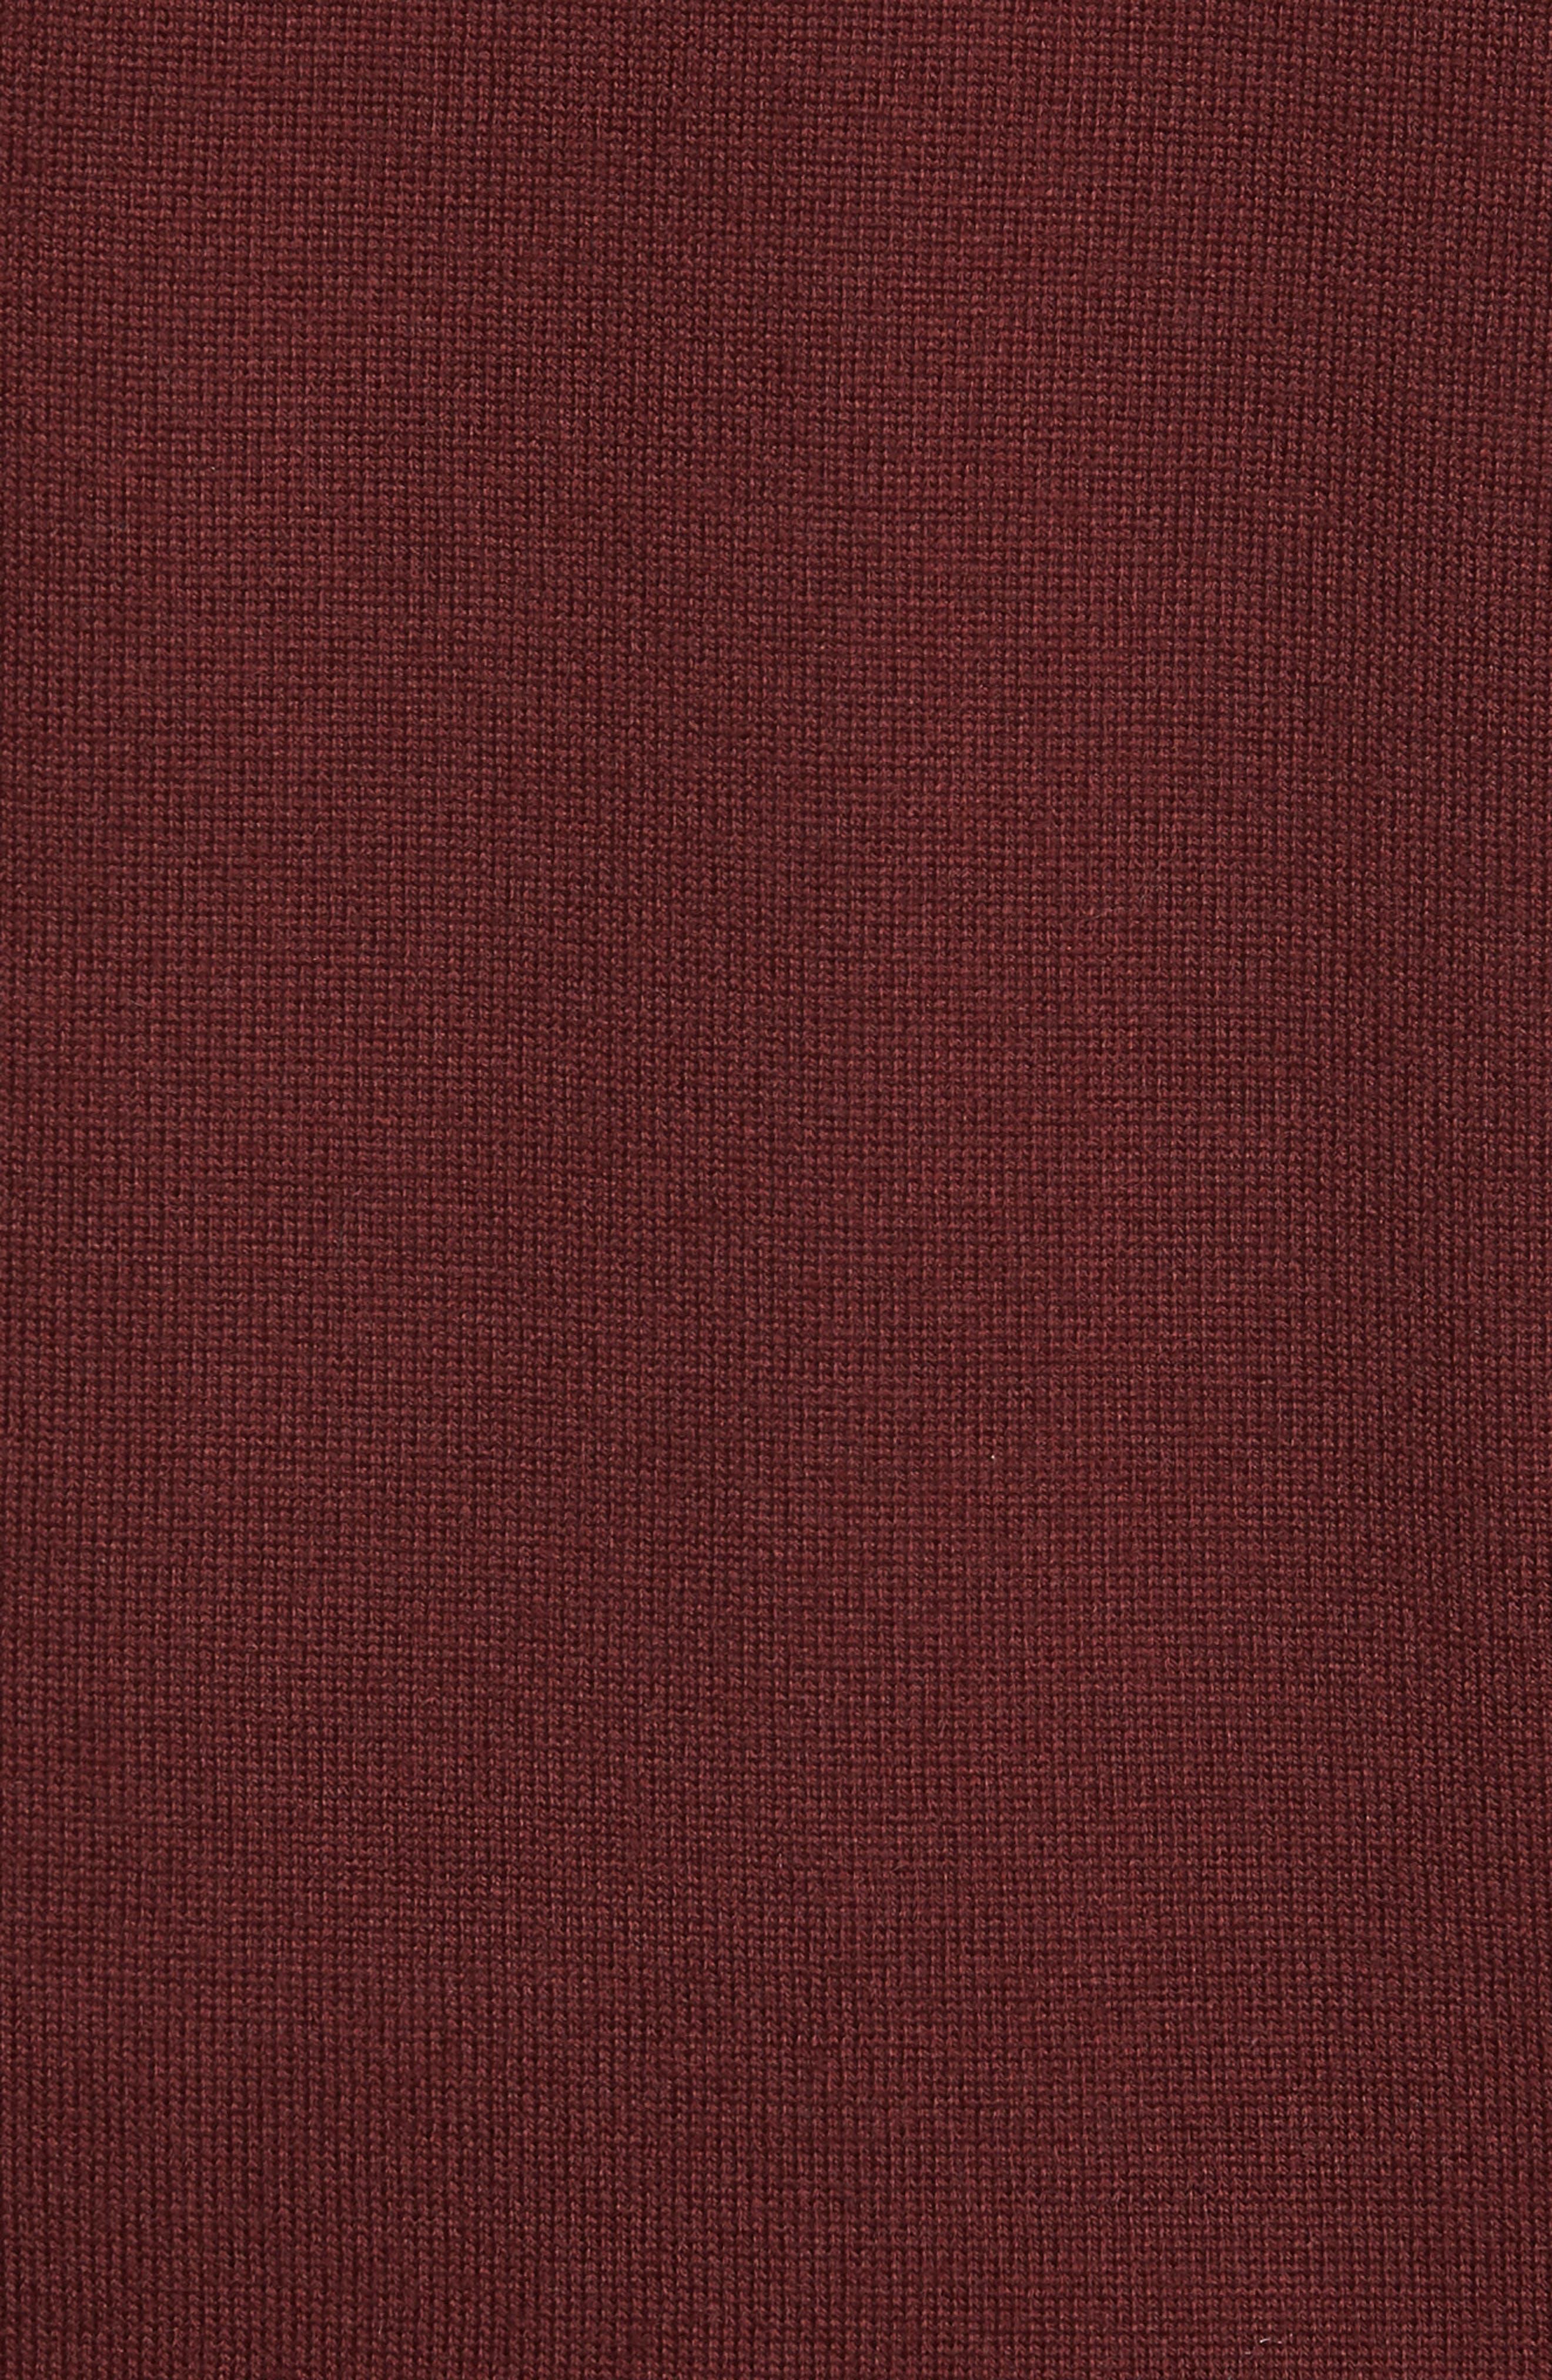 Merino Button Front Sweater Vest,                             Alternate thumbnail 4, color,                             Burgundy Royale